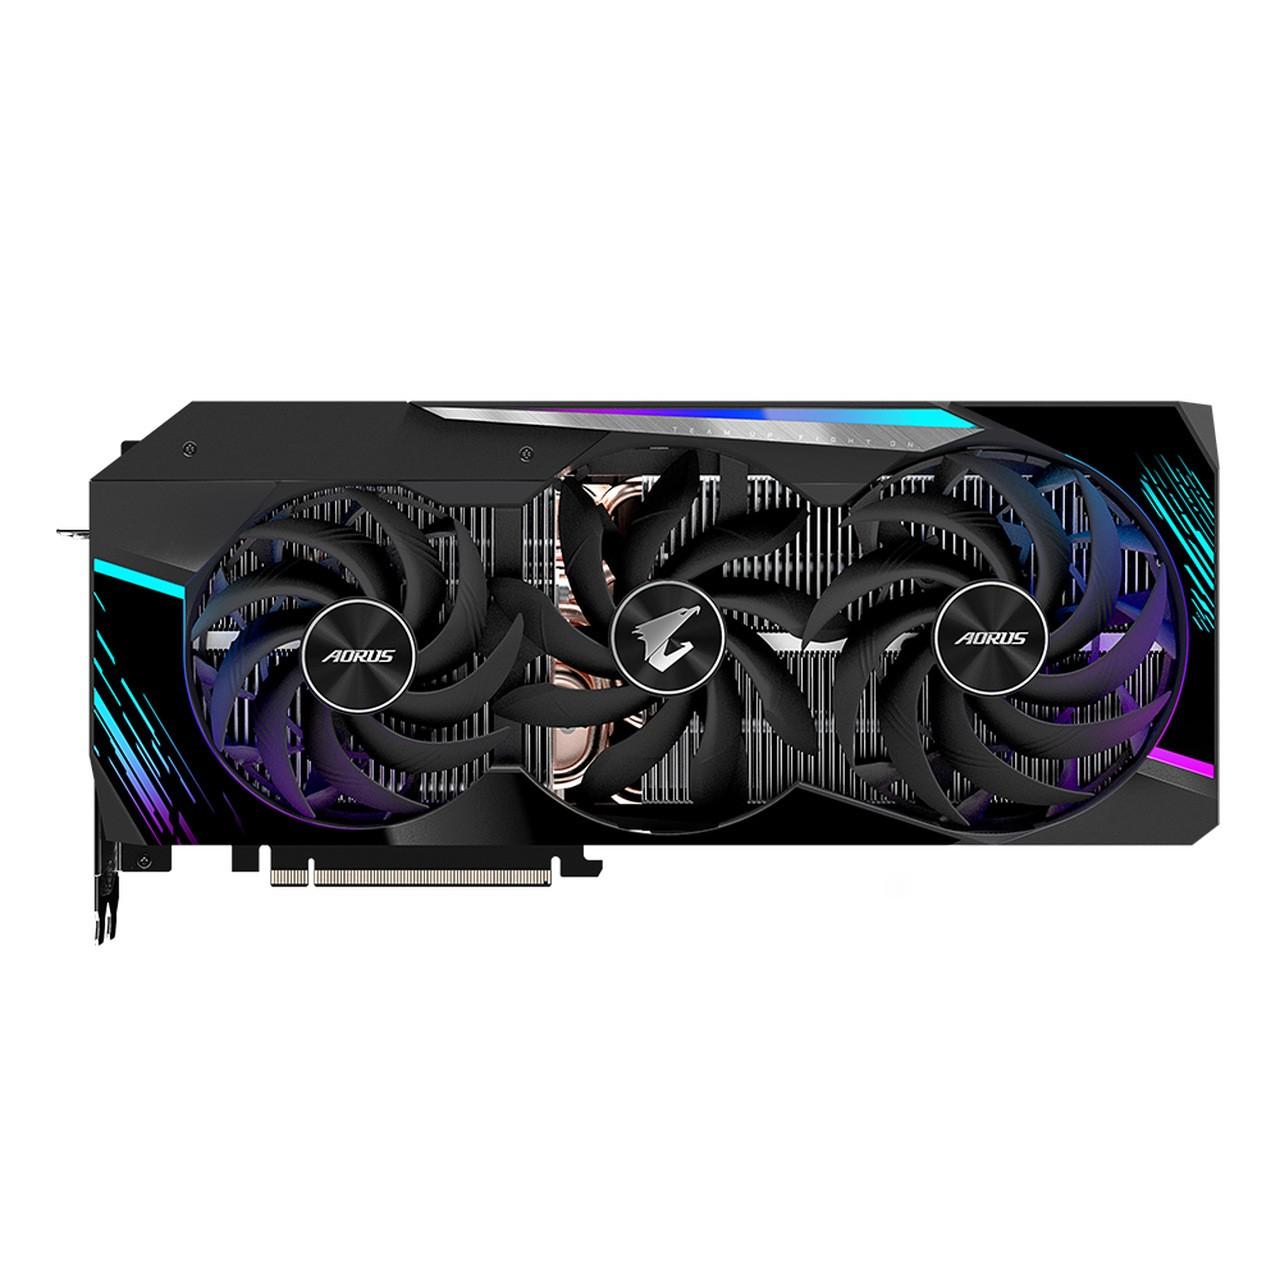 Placa de Video Gigabyte AORUS GeForce RTX 3080 MASTER 10G 10GB GDDR6X 320-bit - GV-N3080AORUS M-10GD